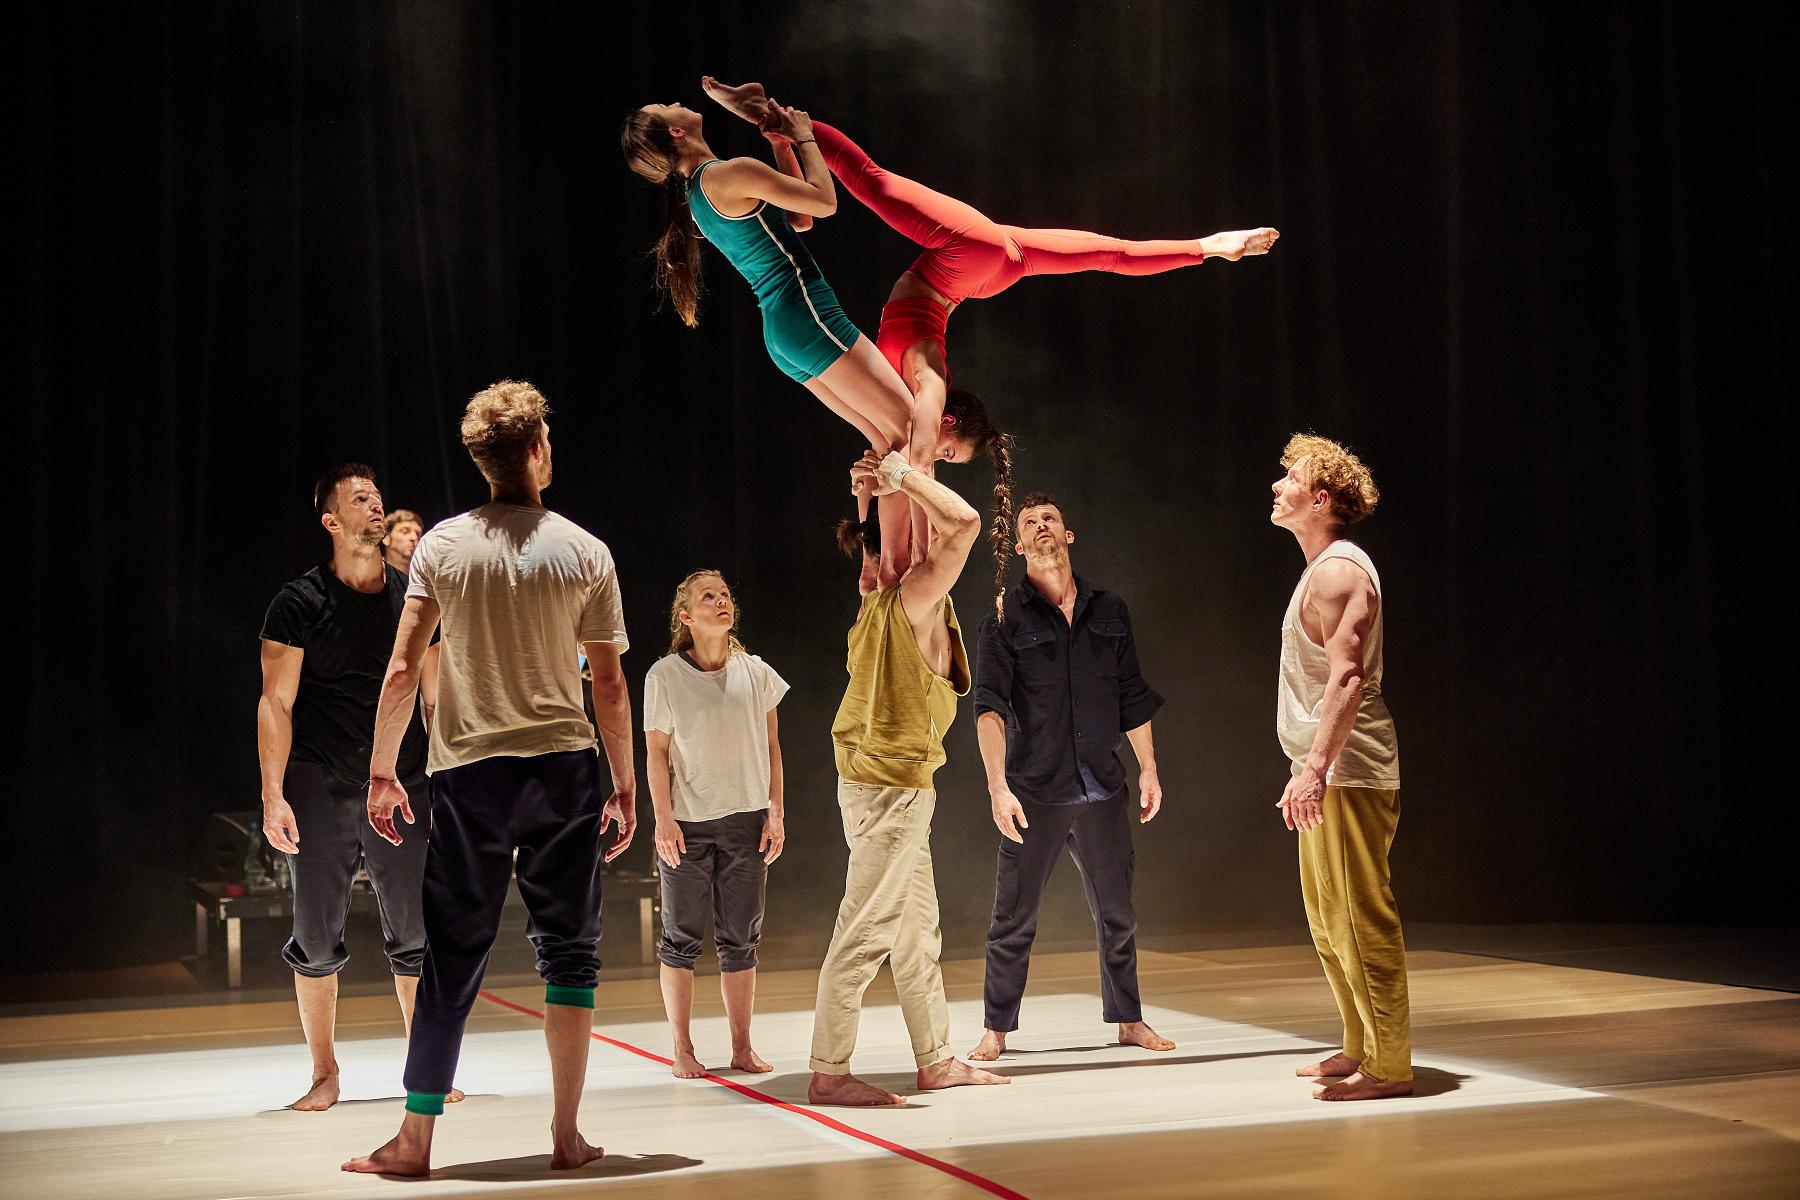 Losers Cirque Company: KONKURZ | Komedianti v ulicích 2021 | Tábor